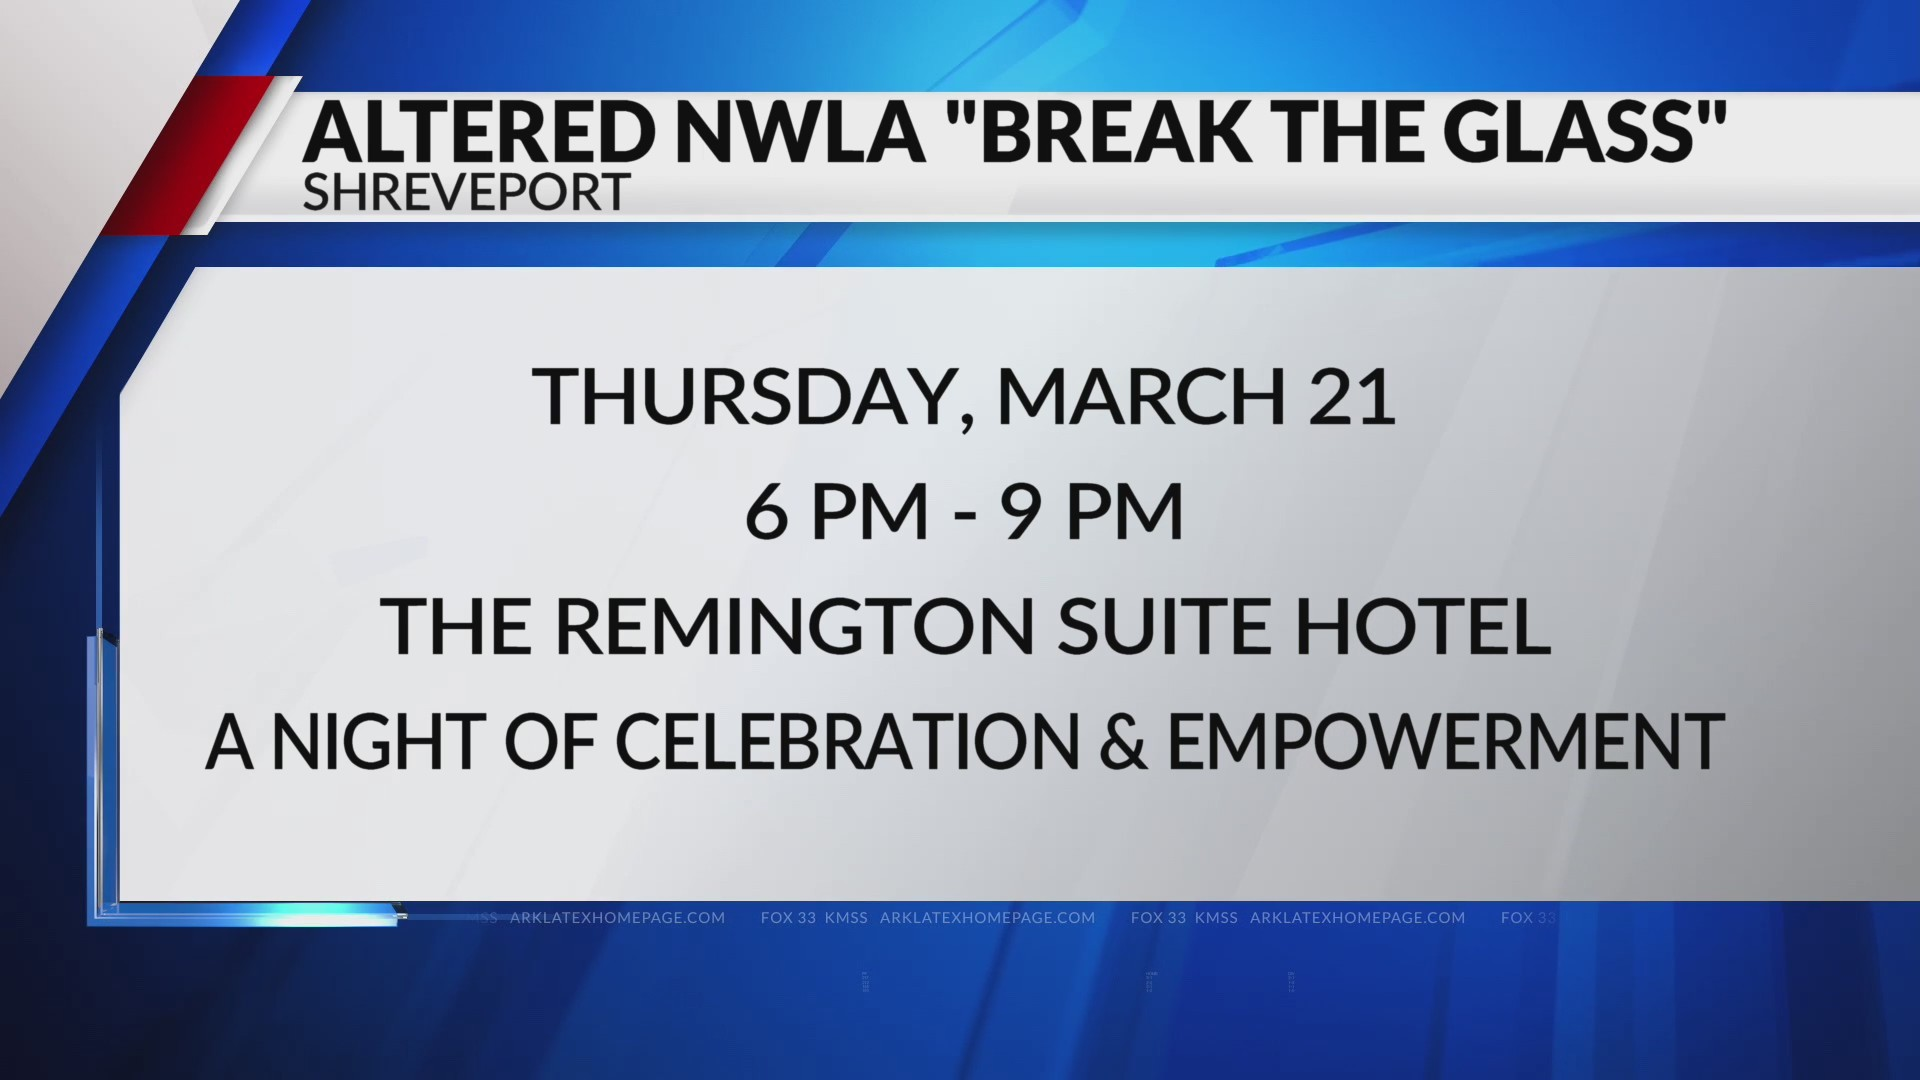 Break the Glass 2019 Altered NWLA Fox